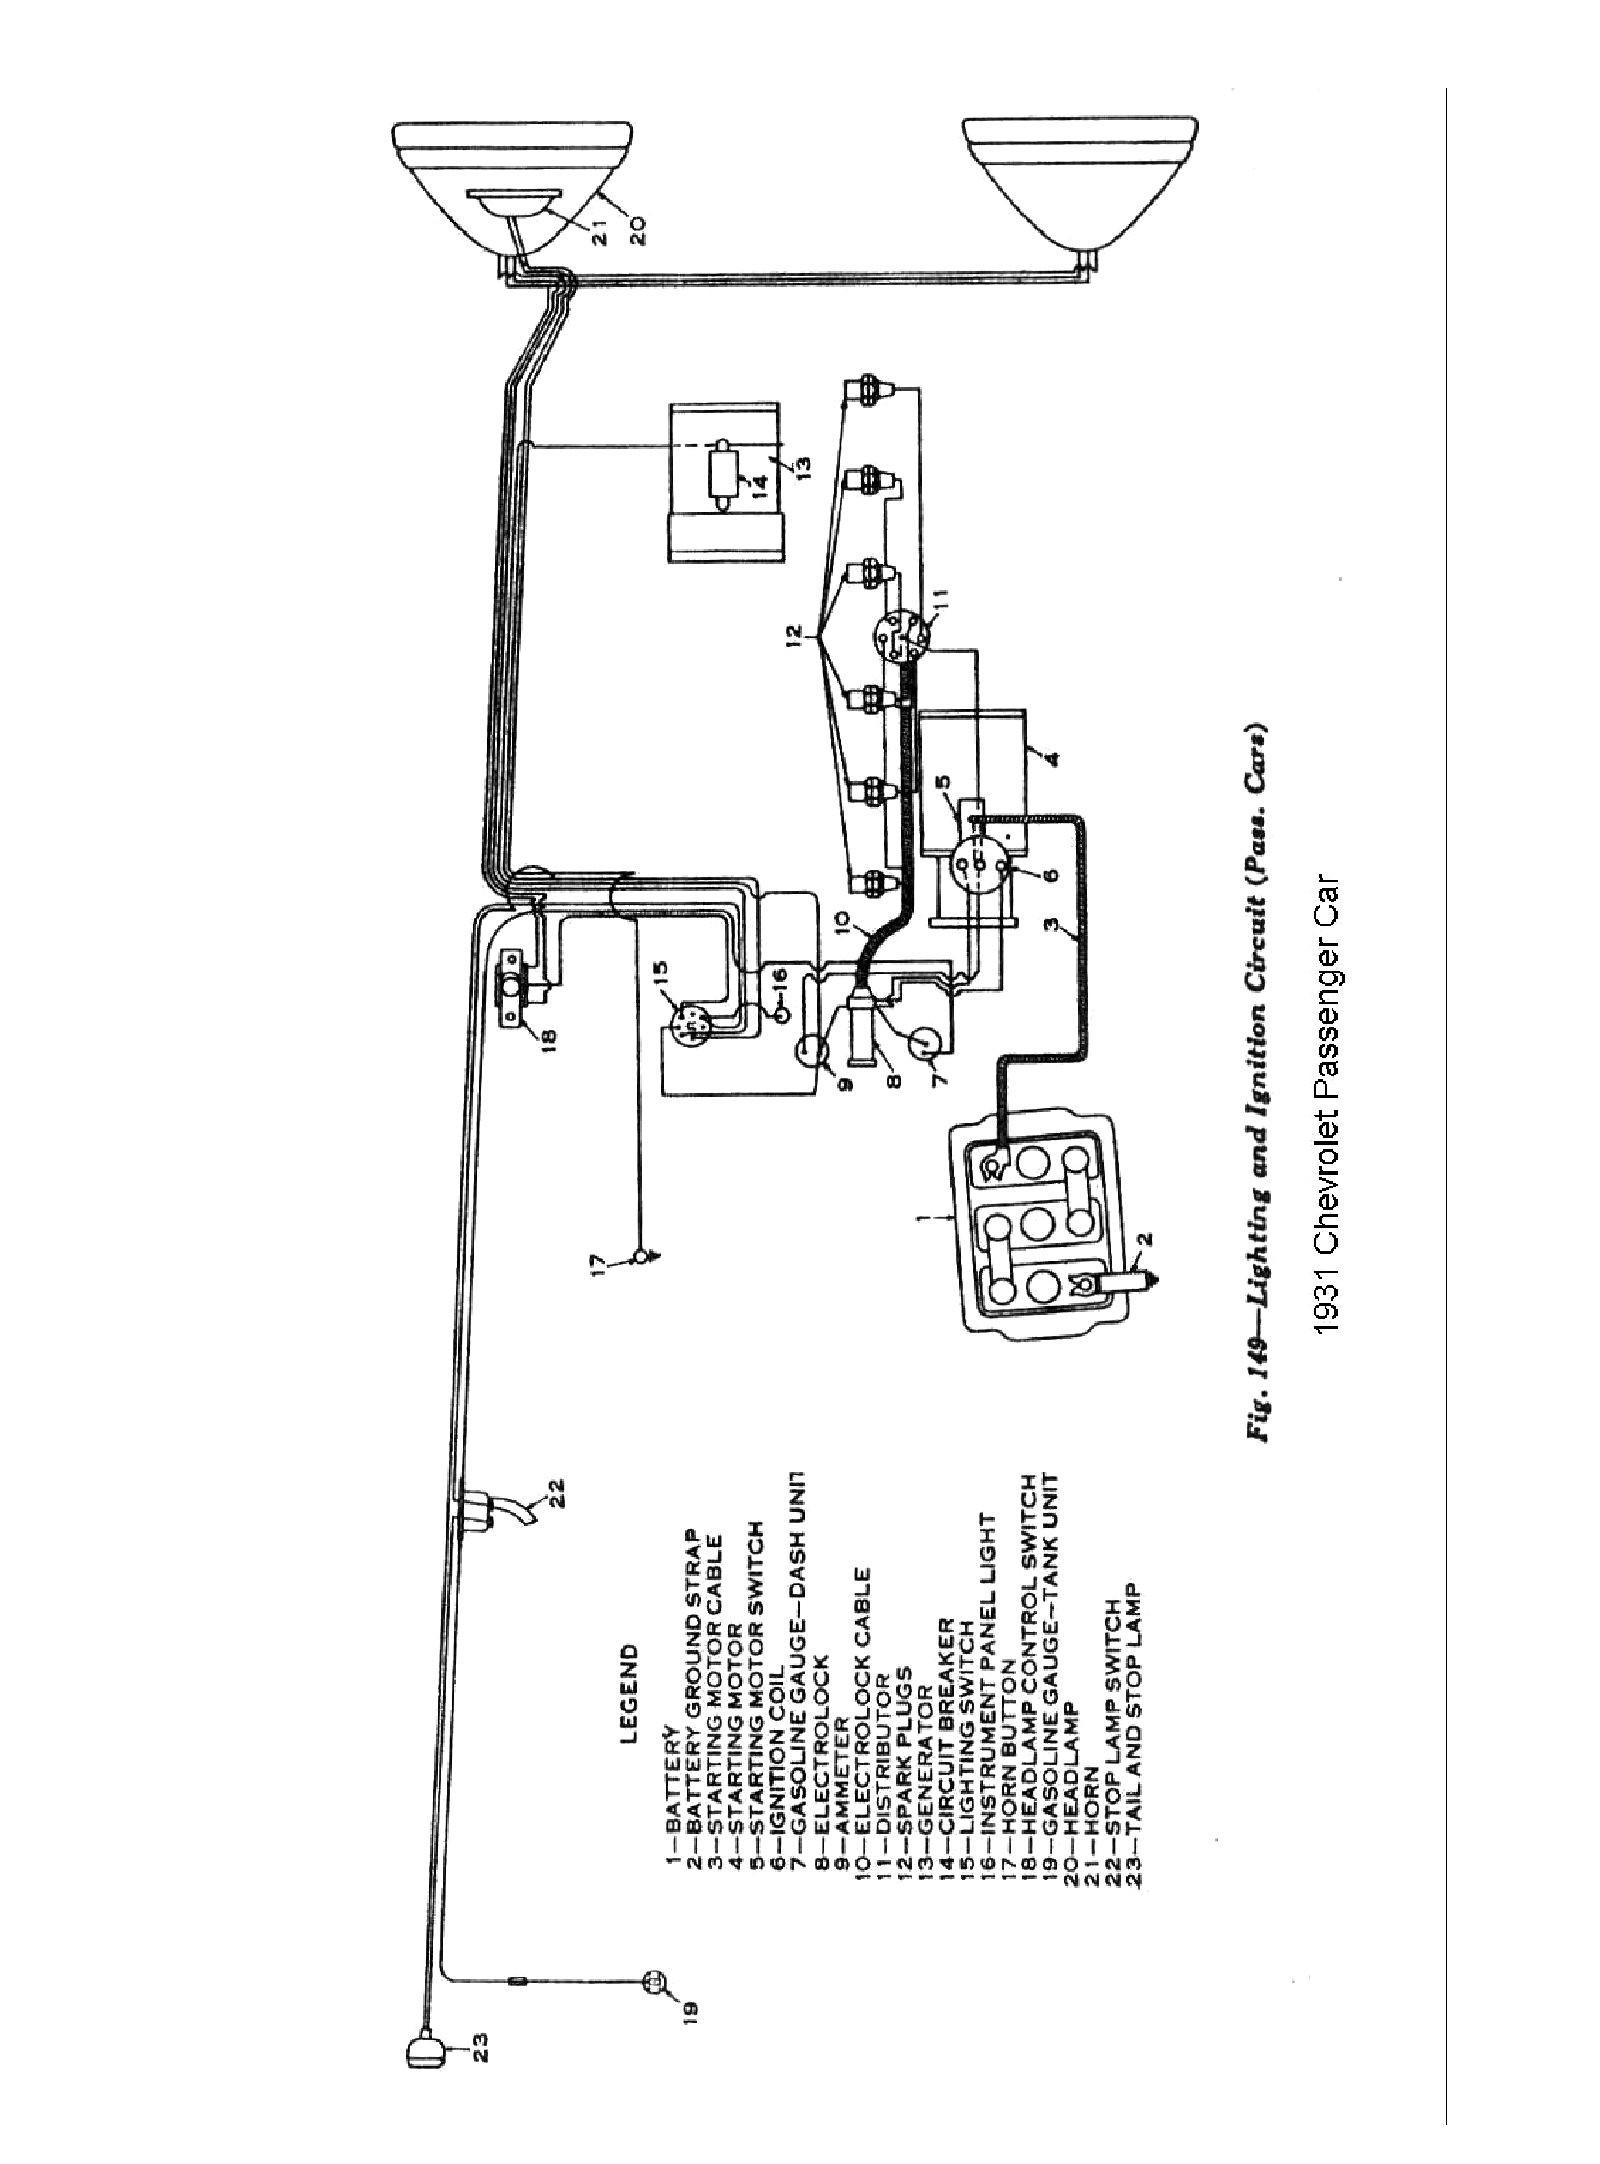 hight resolution of wiring diagram of mazda 323